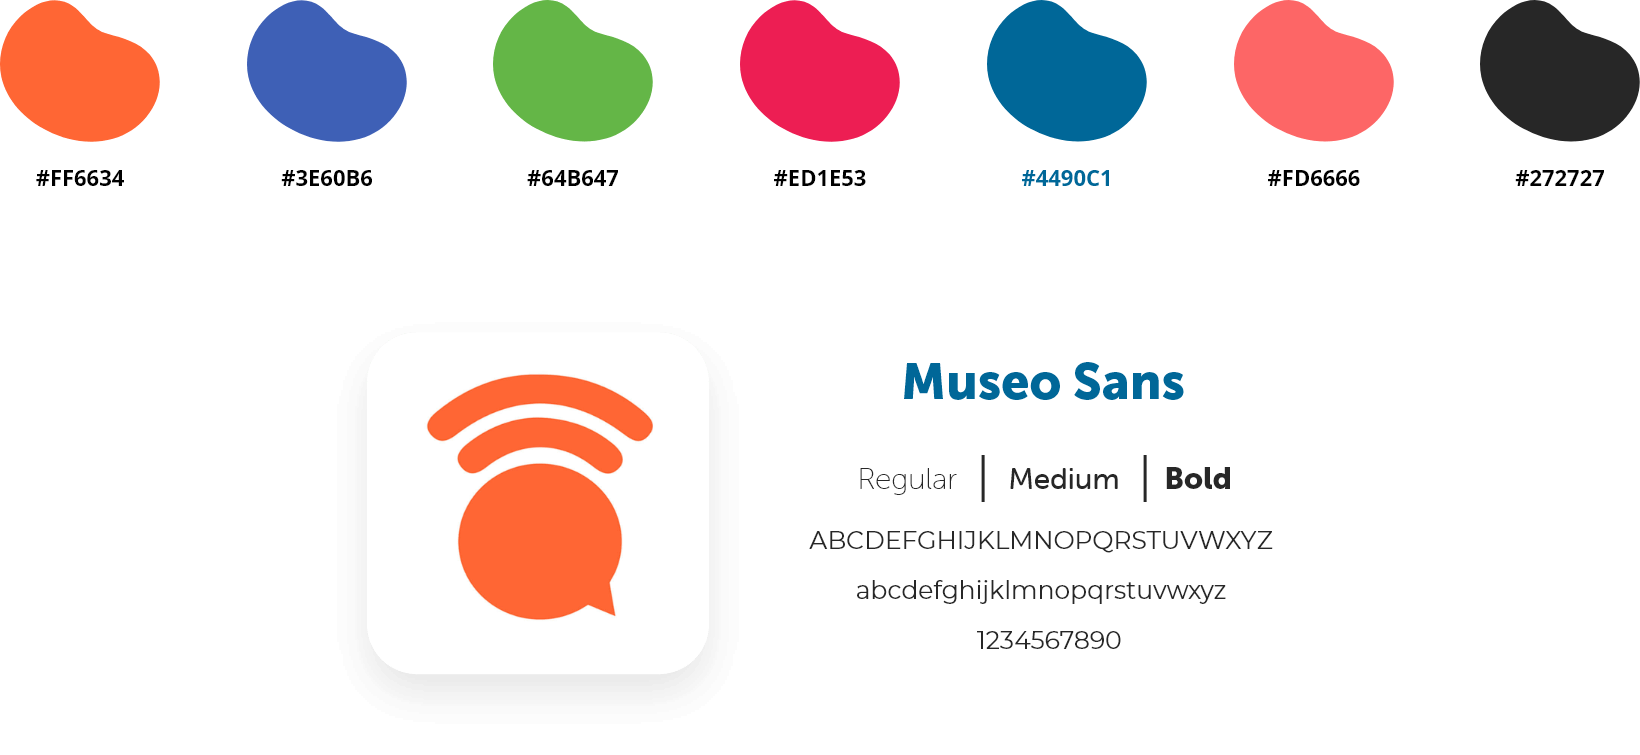 conduct app font color